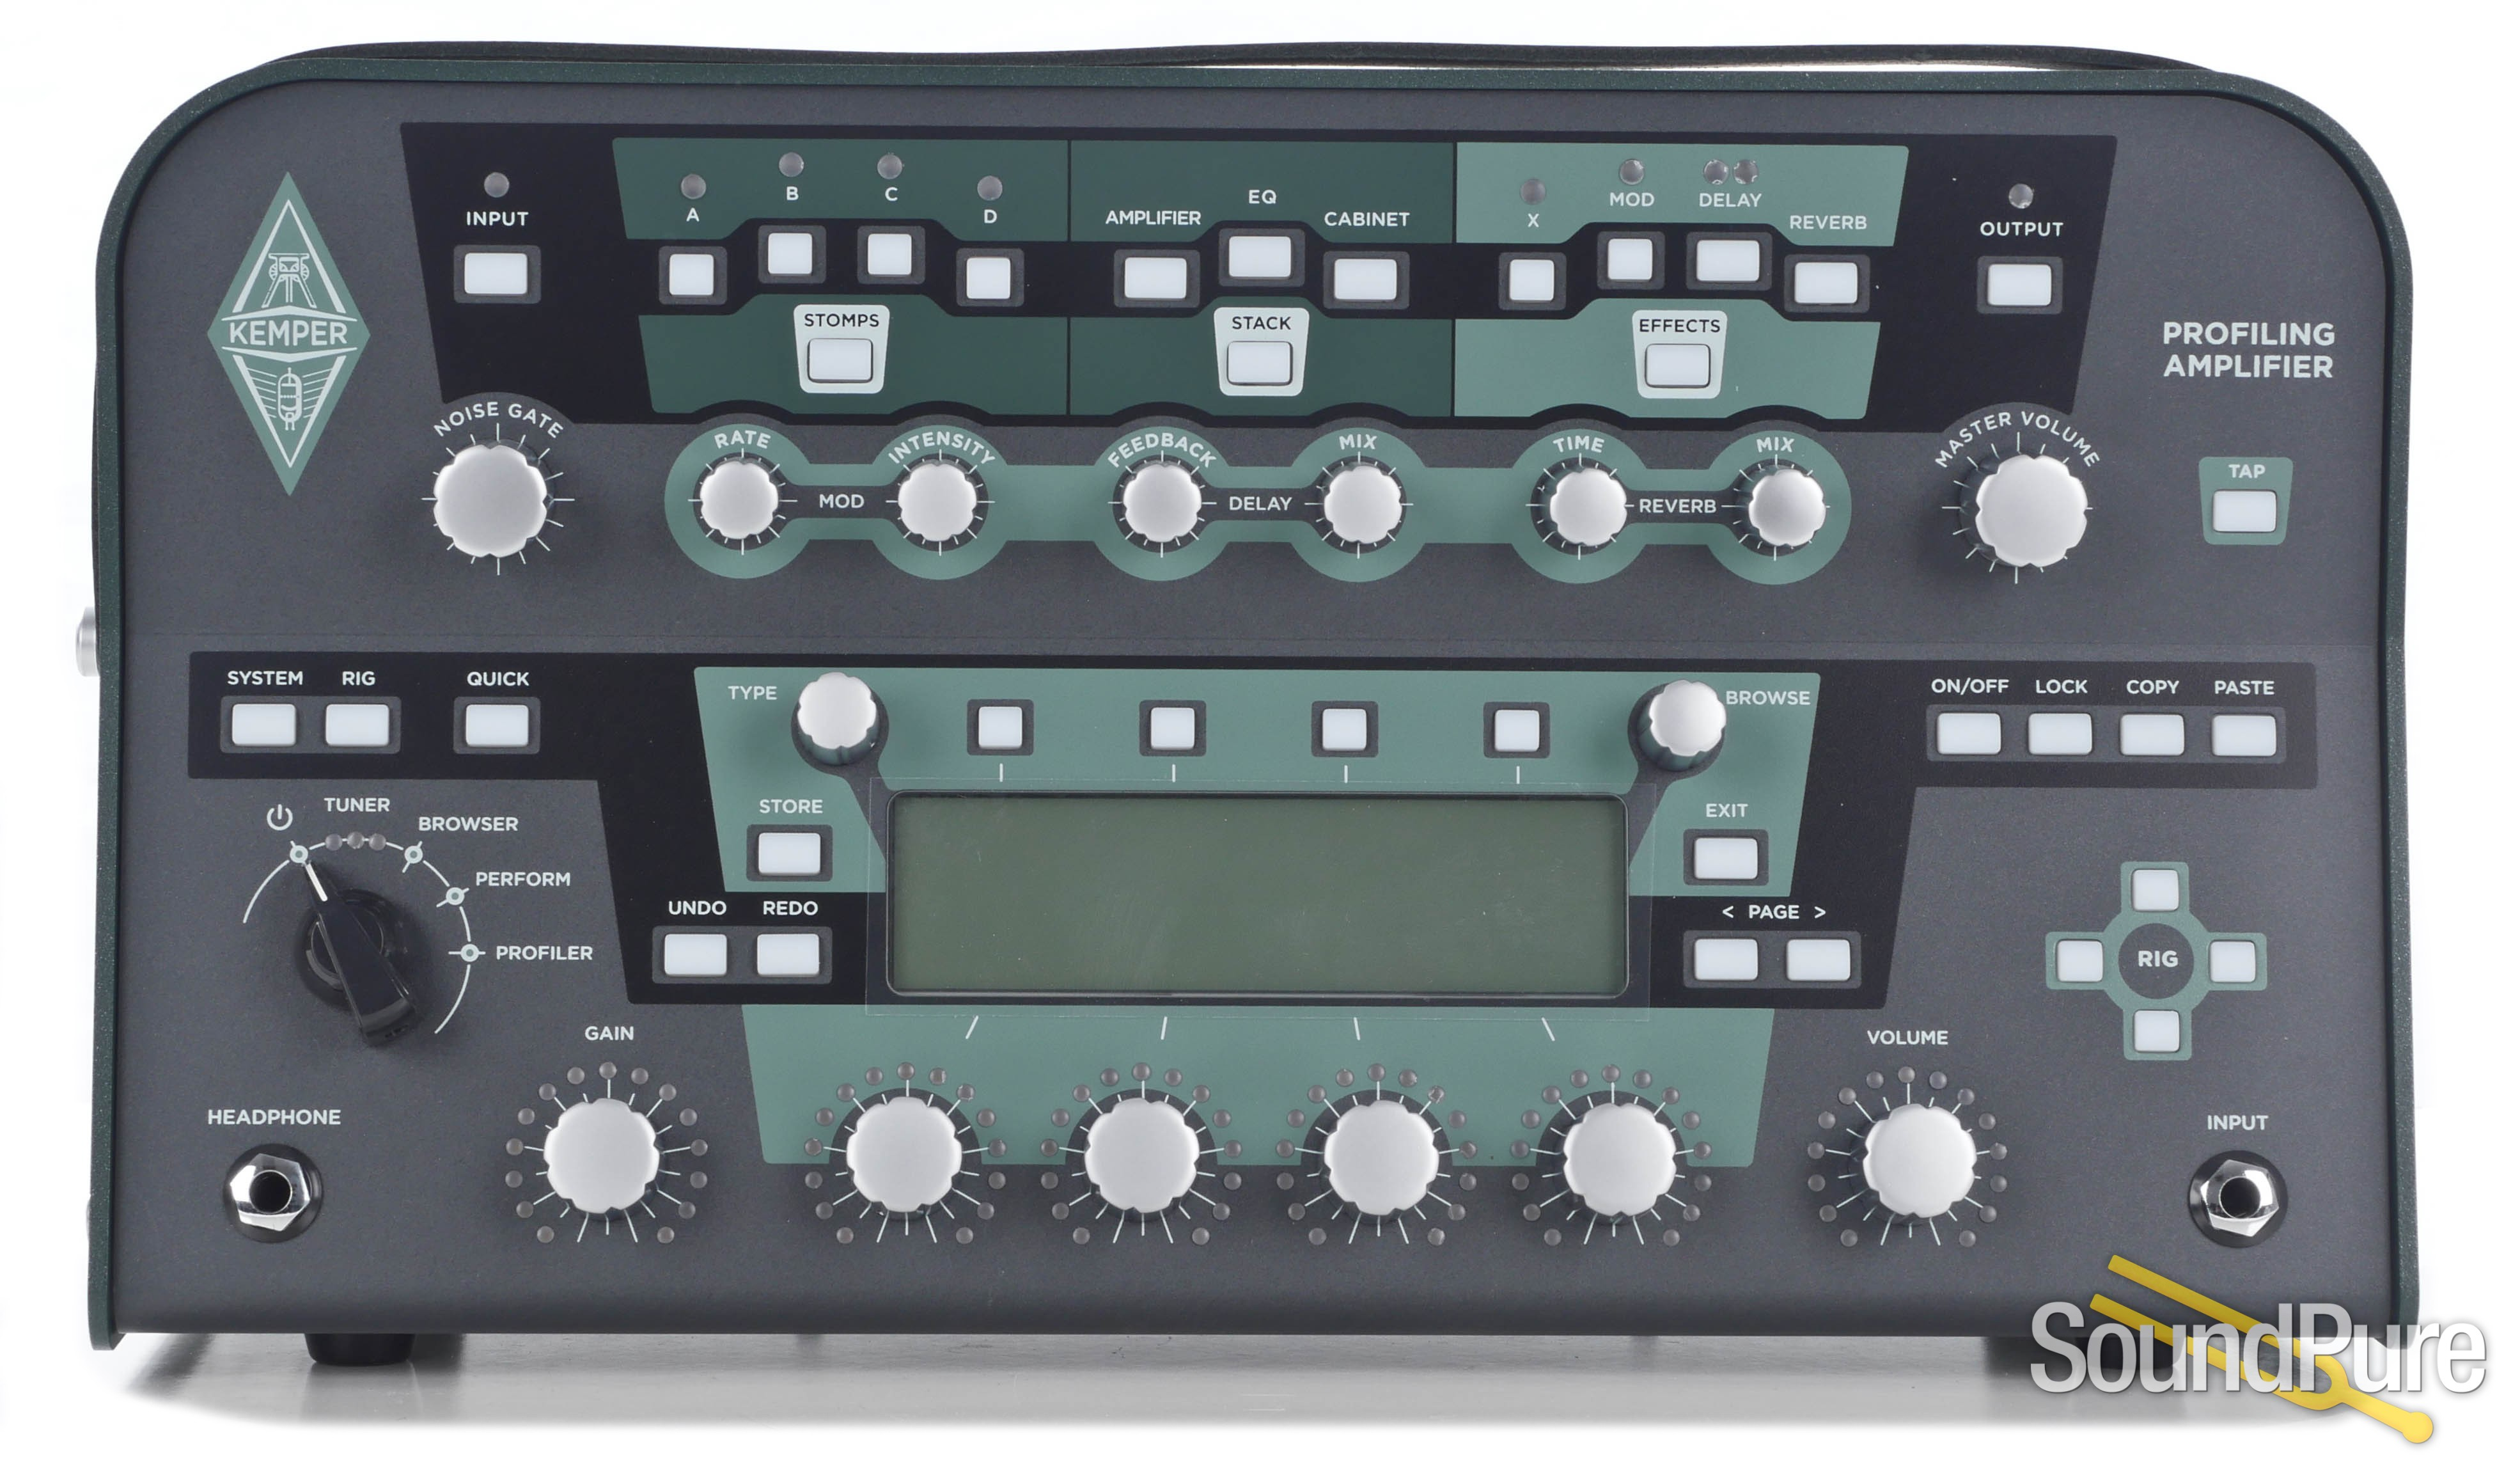 Kemper Profiler PowerHead Profiling Amplifier - Used